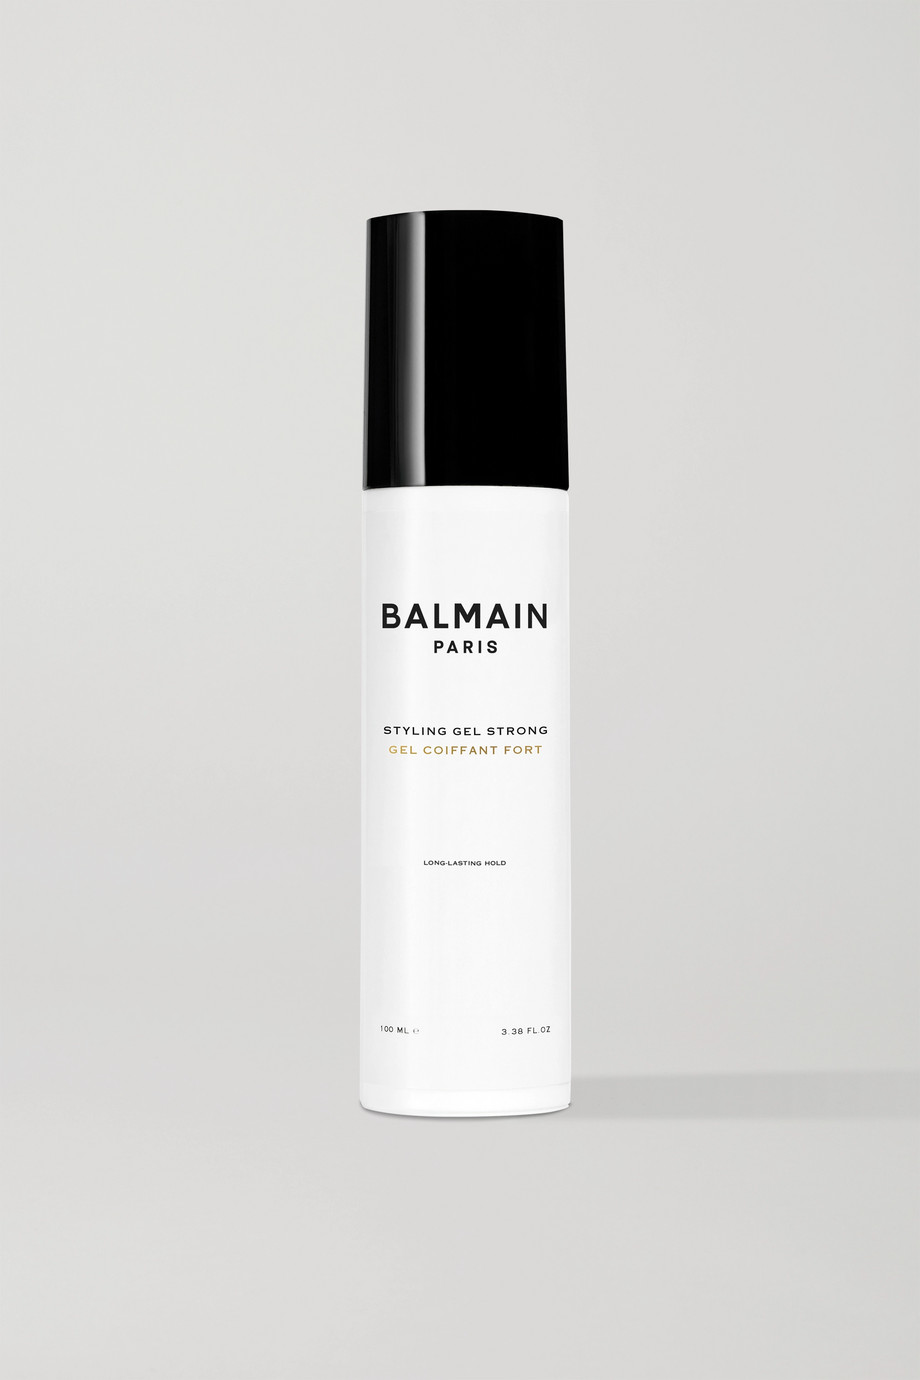 Balmain Paris Hair Couture Styling Gel Strong, 100ml